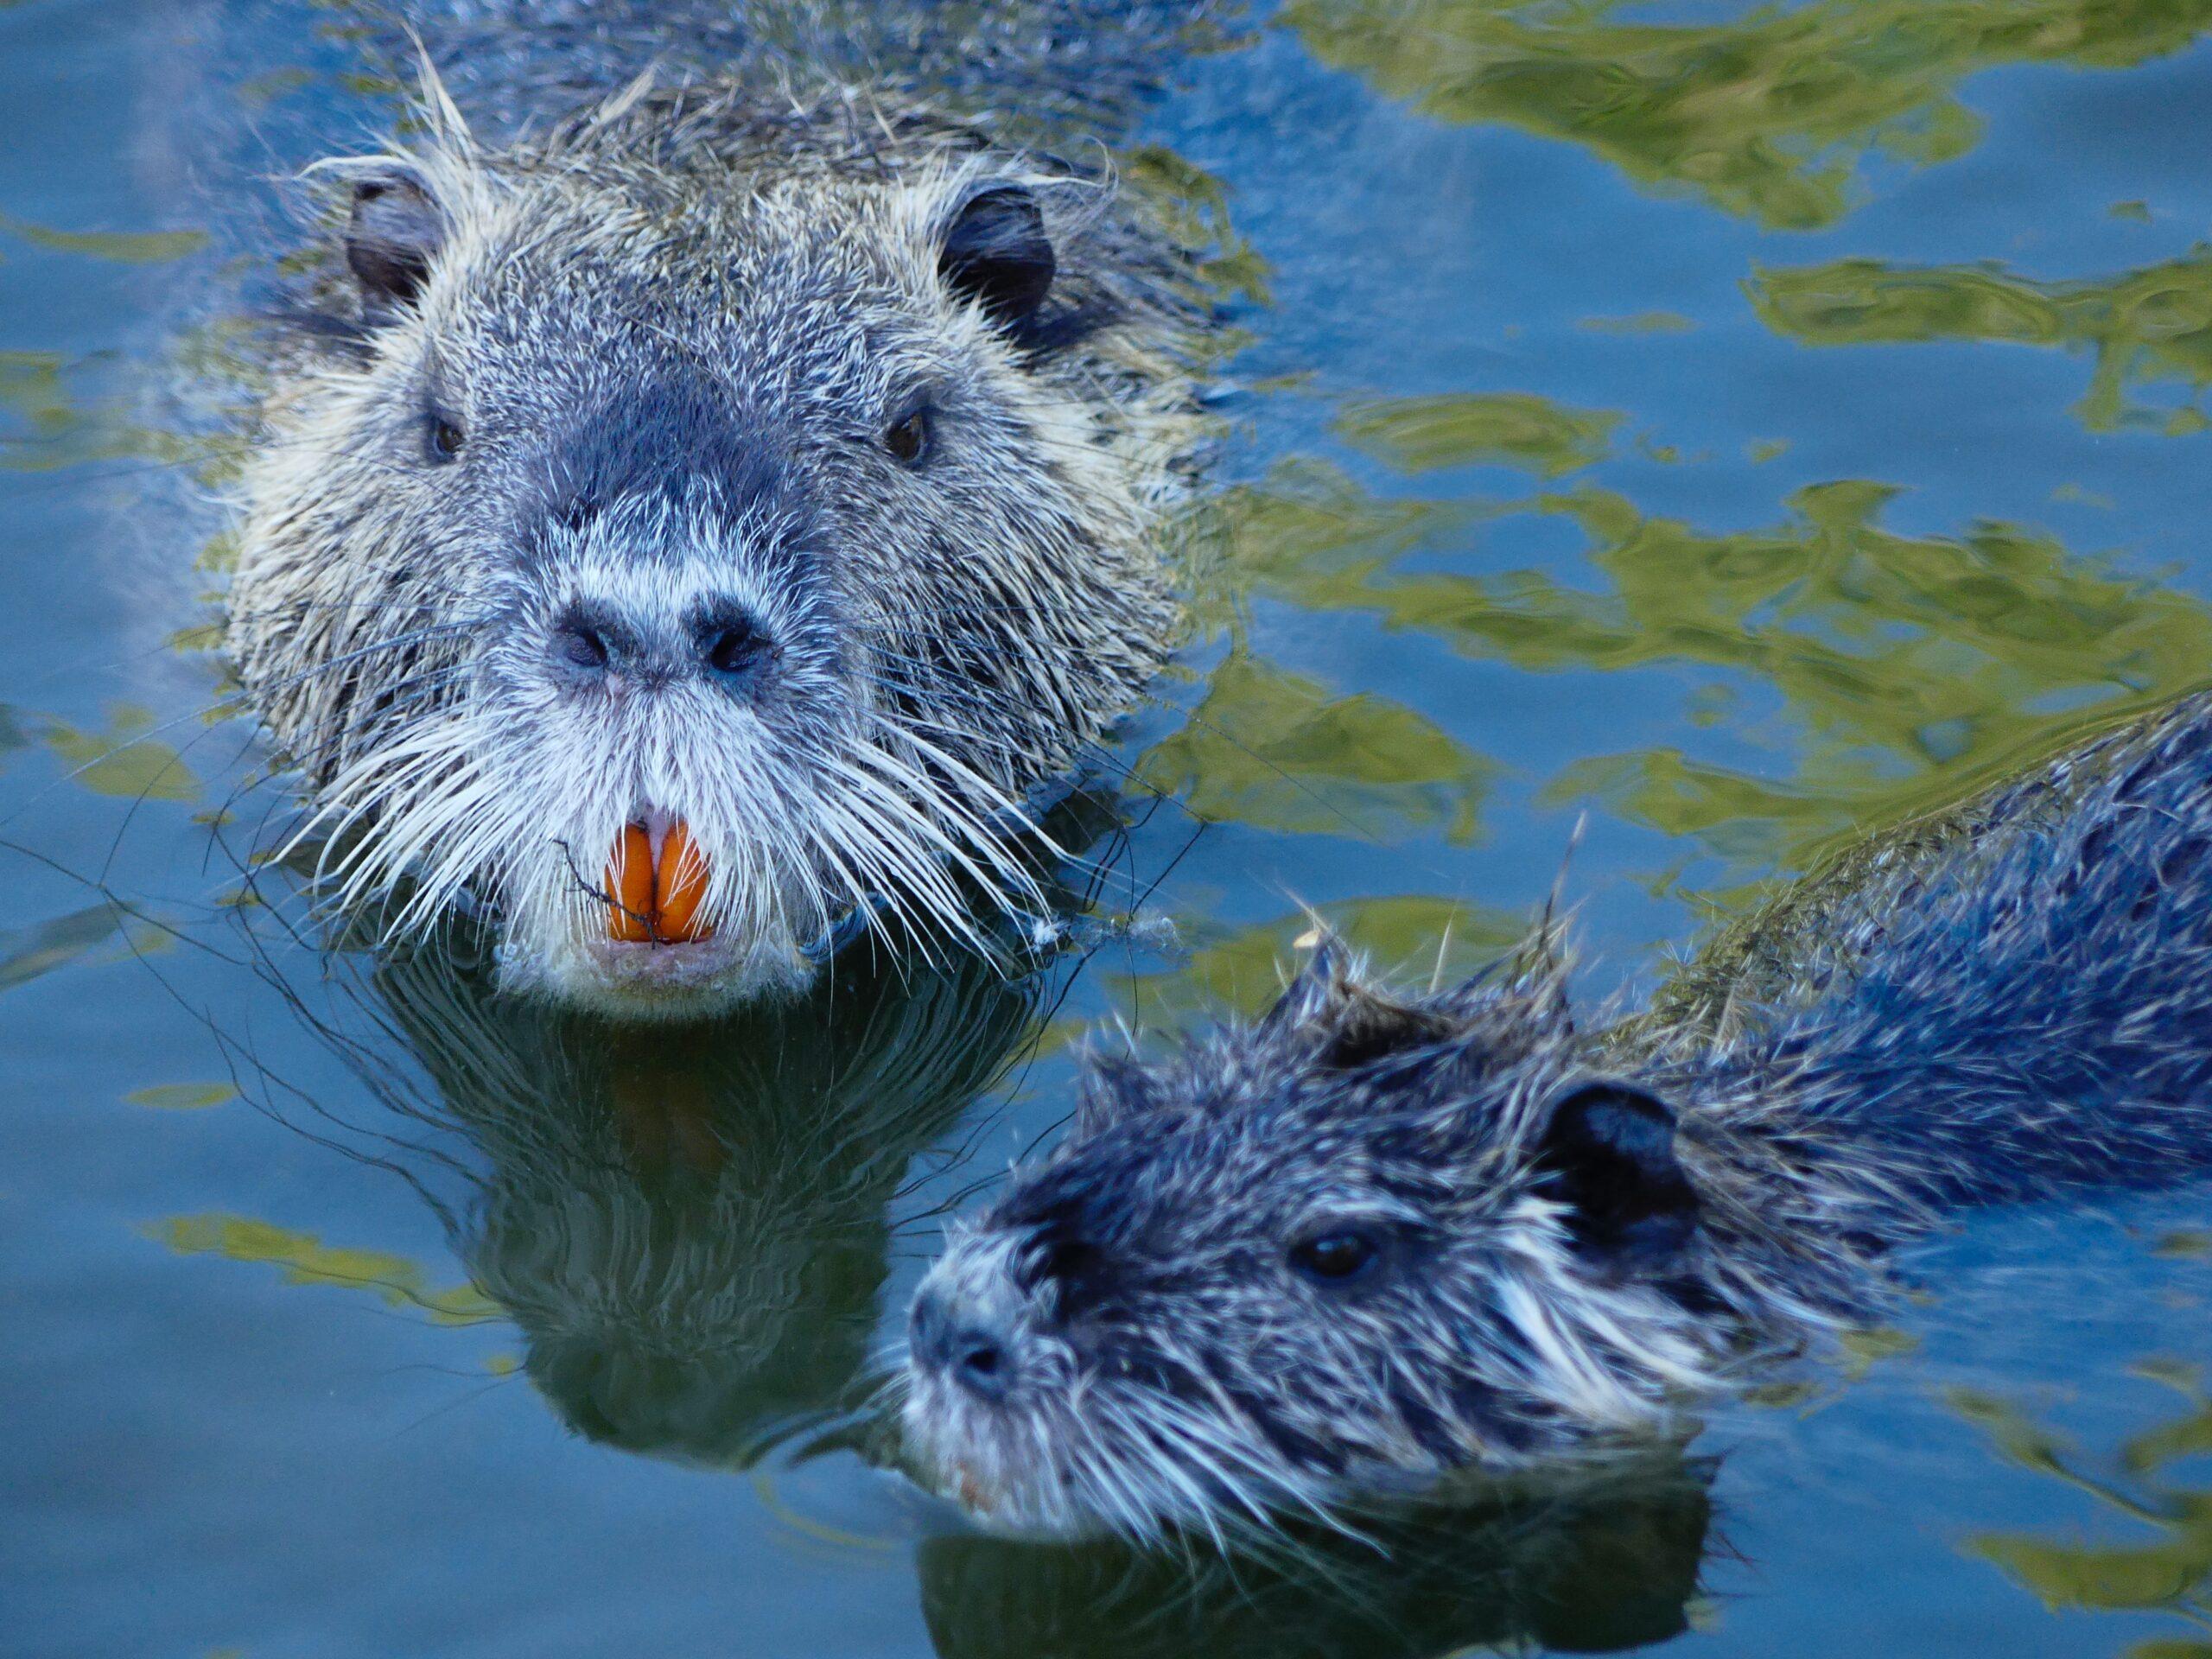 Beavers